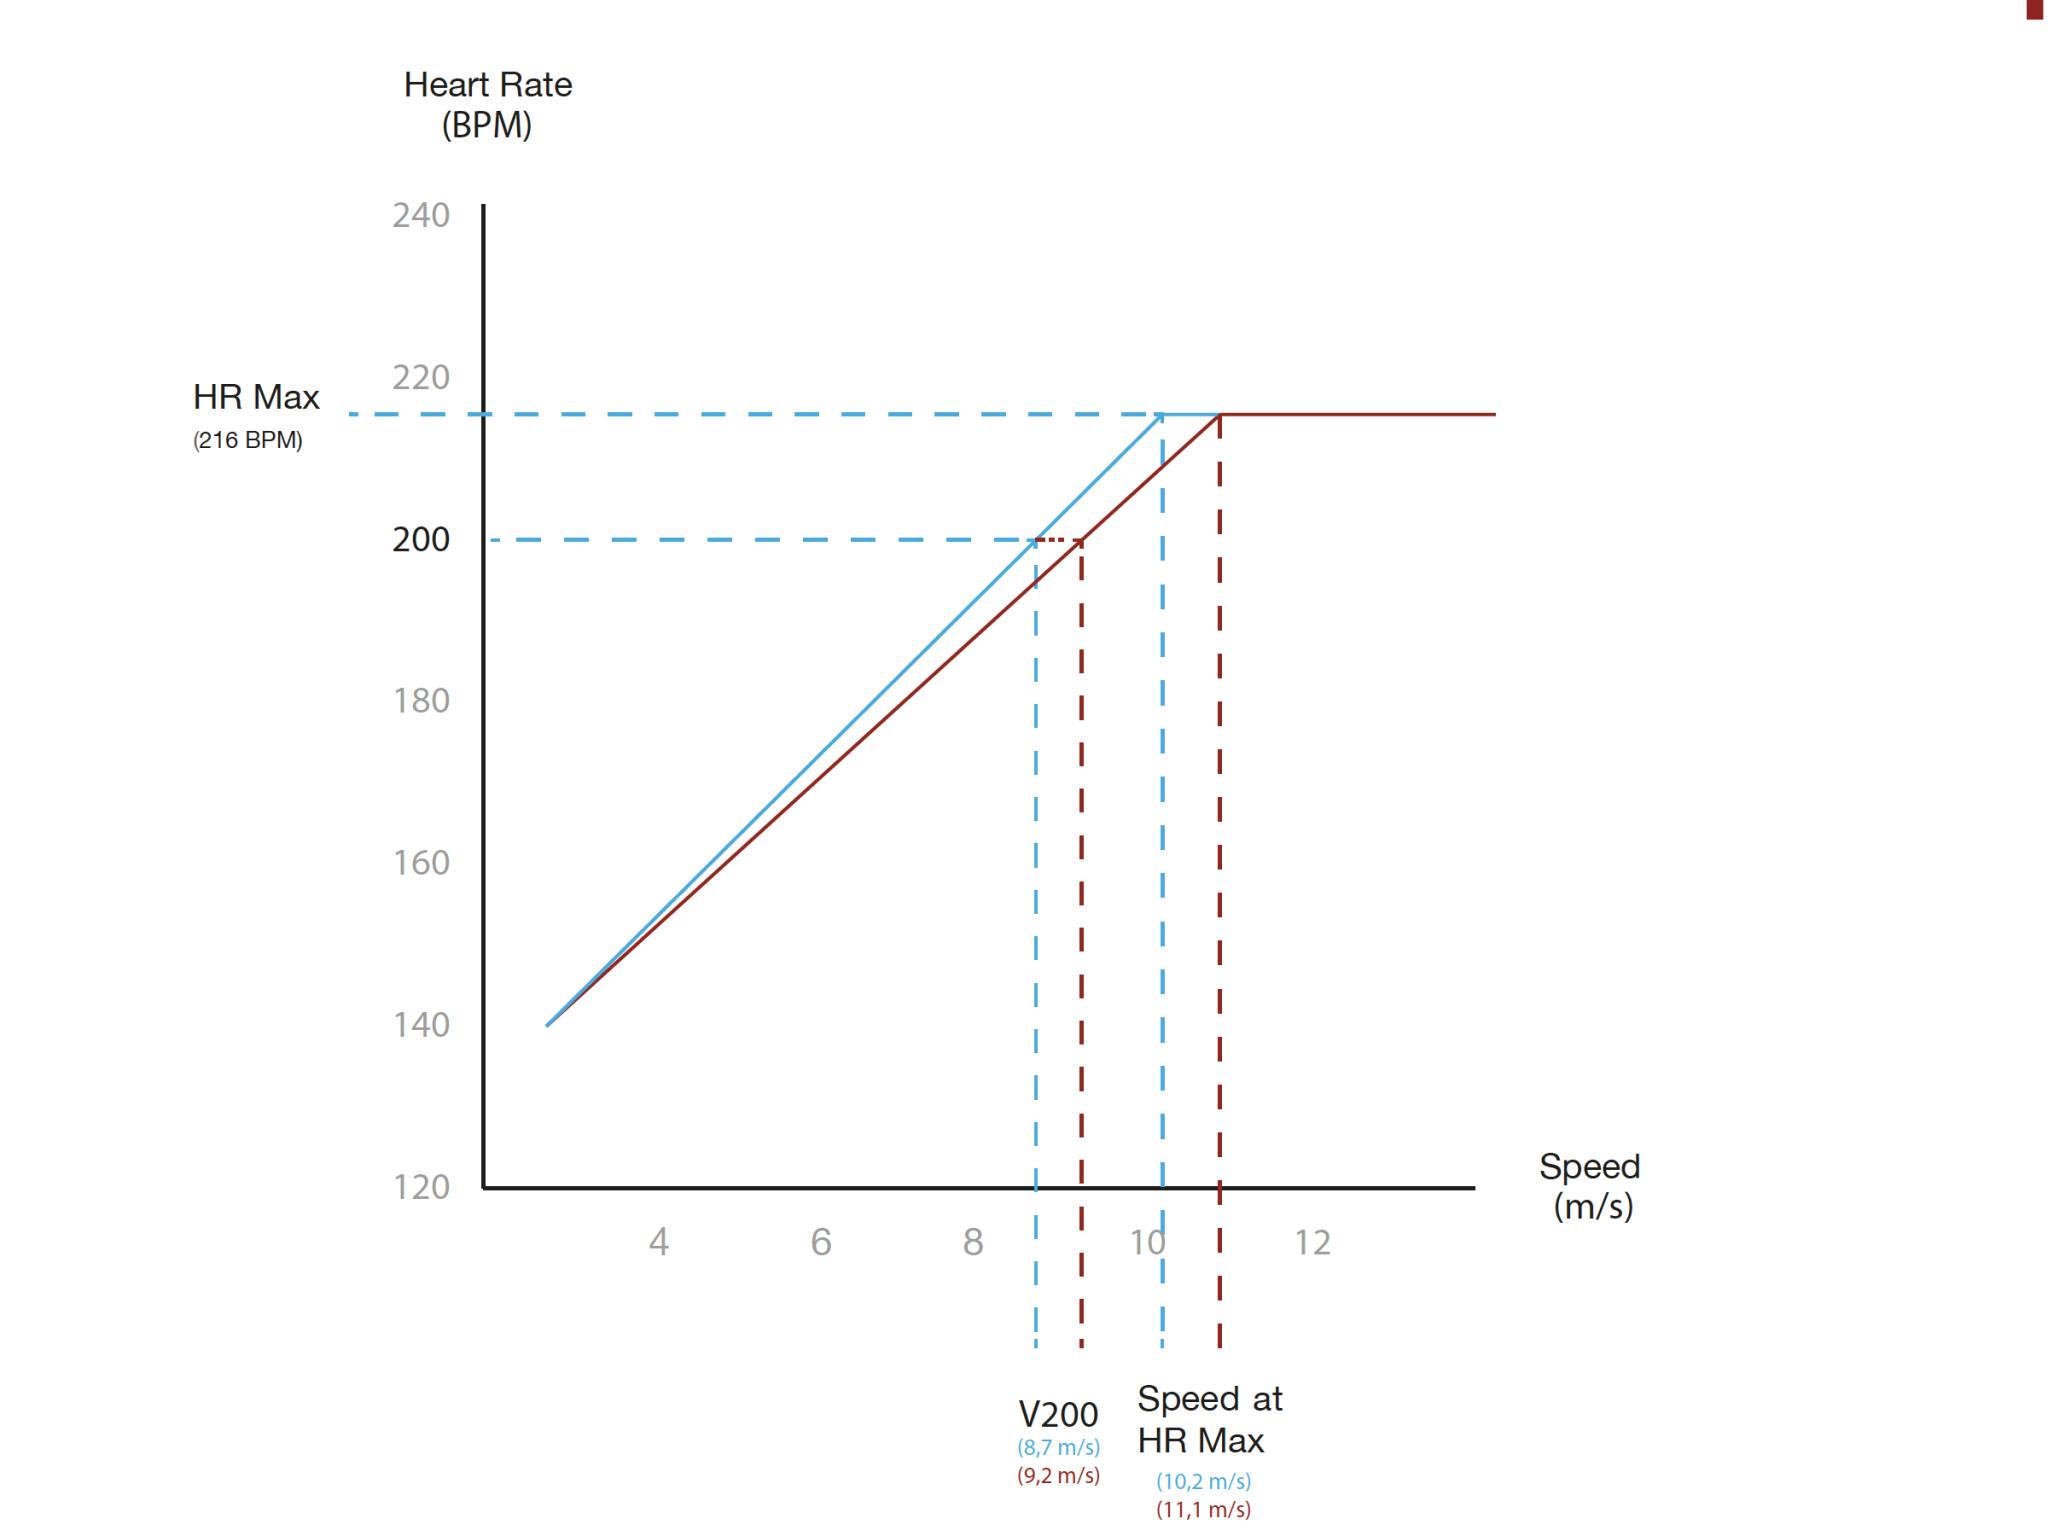 Evolution of speed at 200BPM (V200)